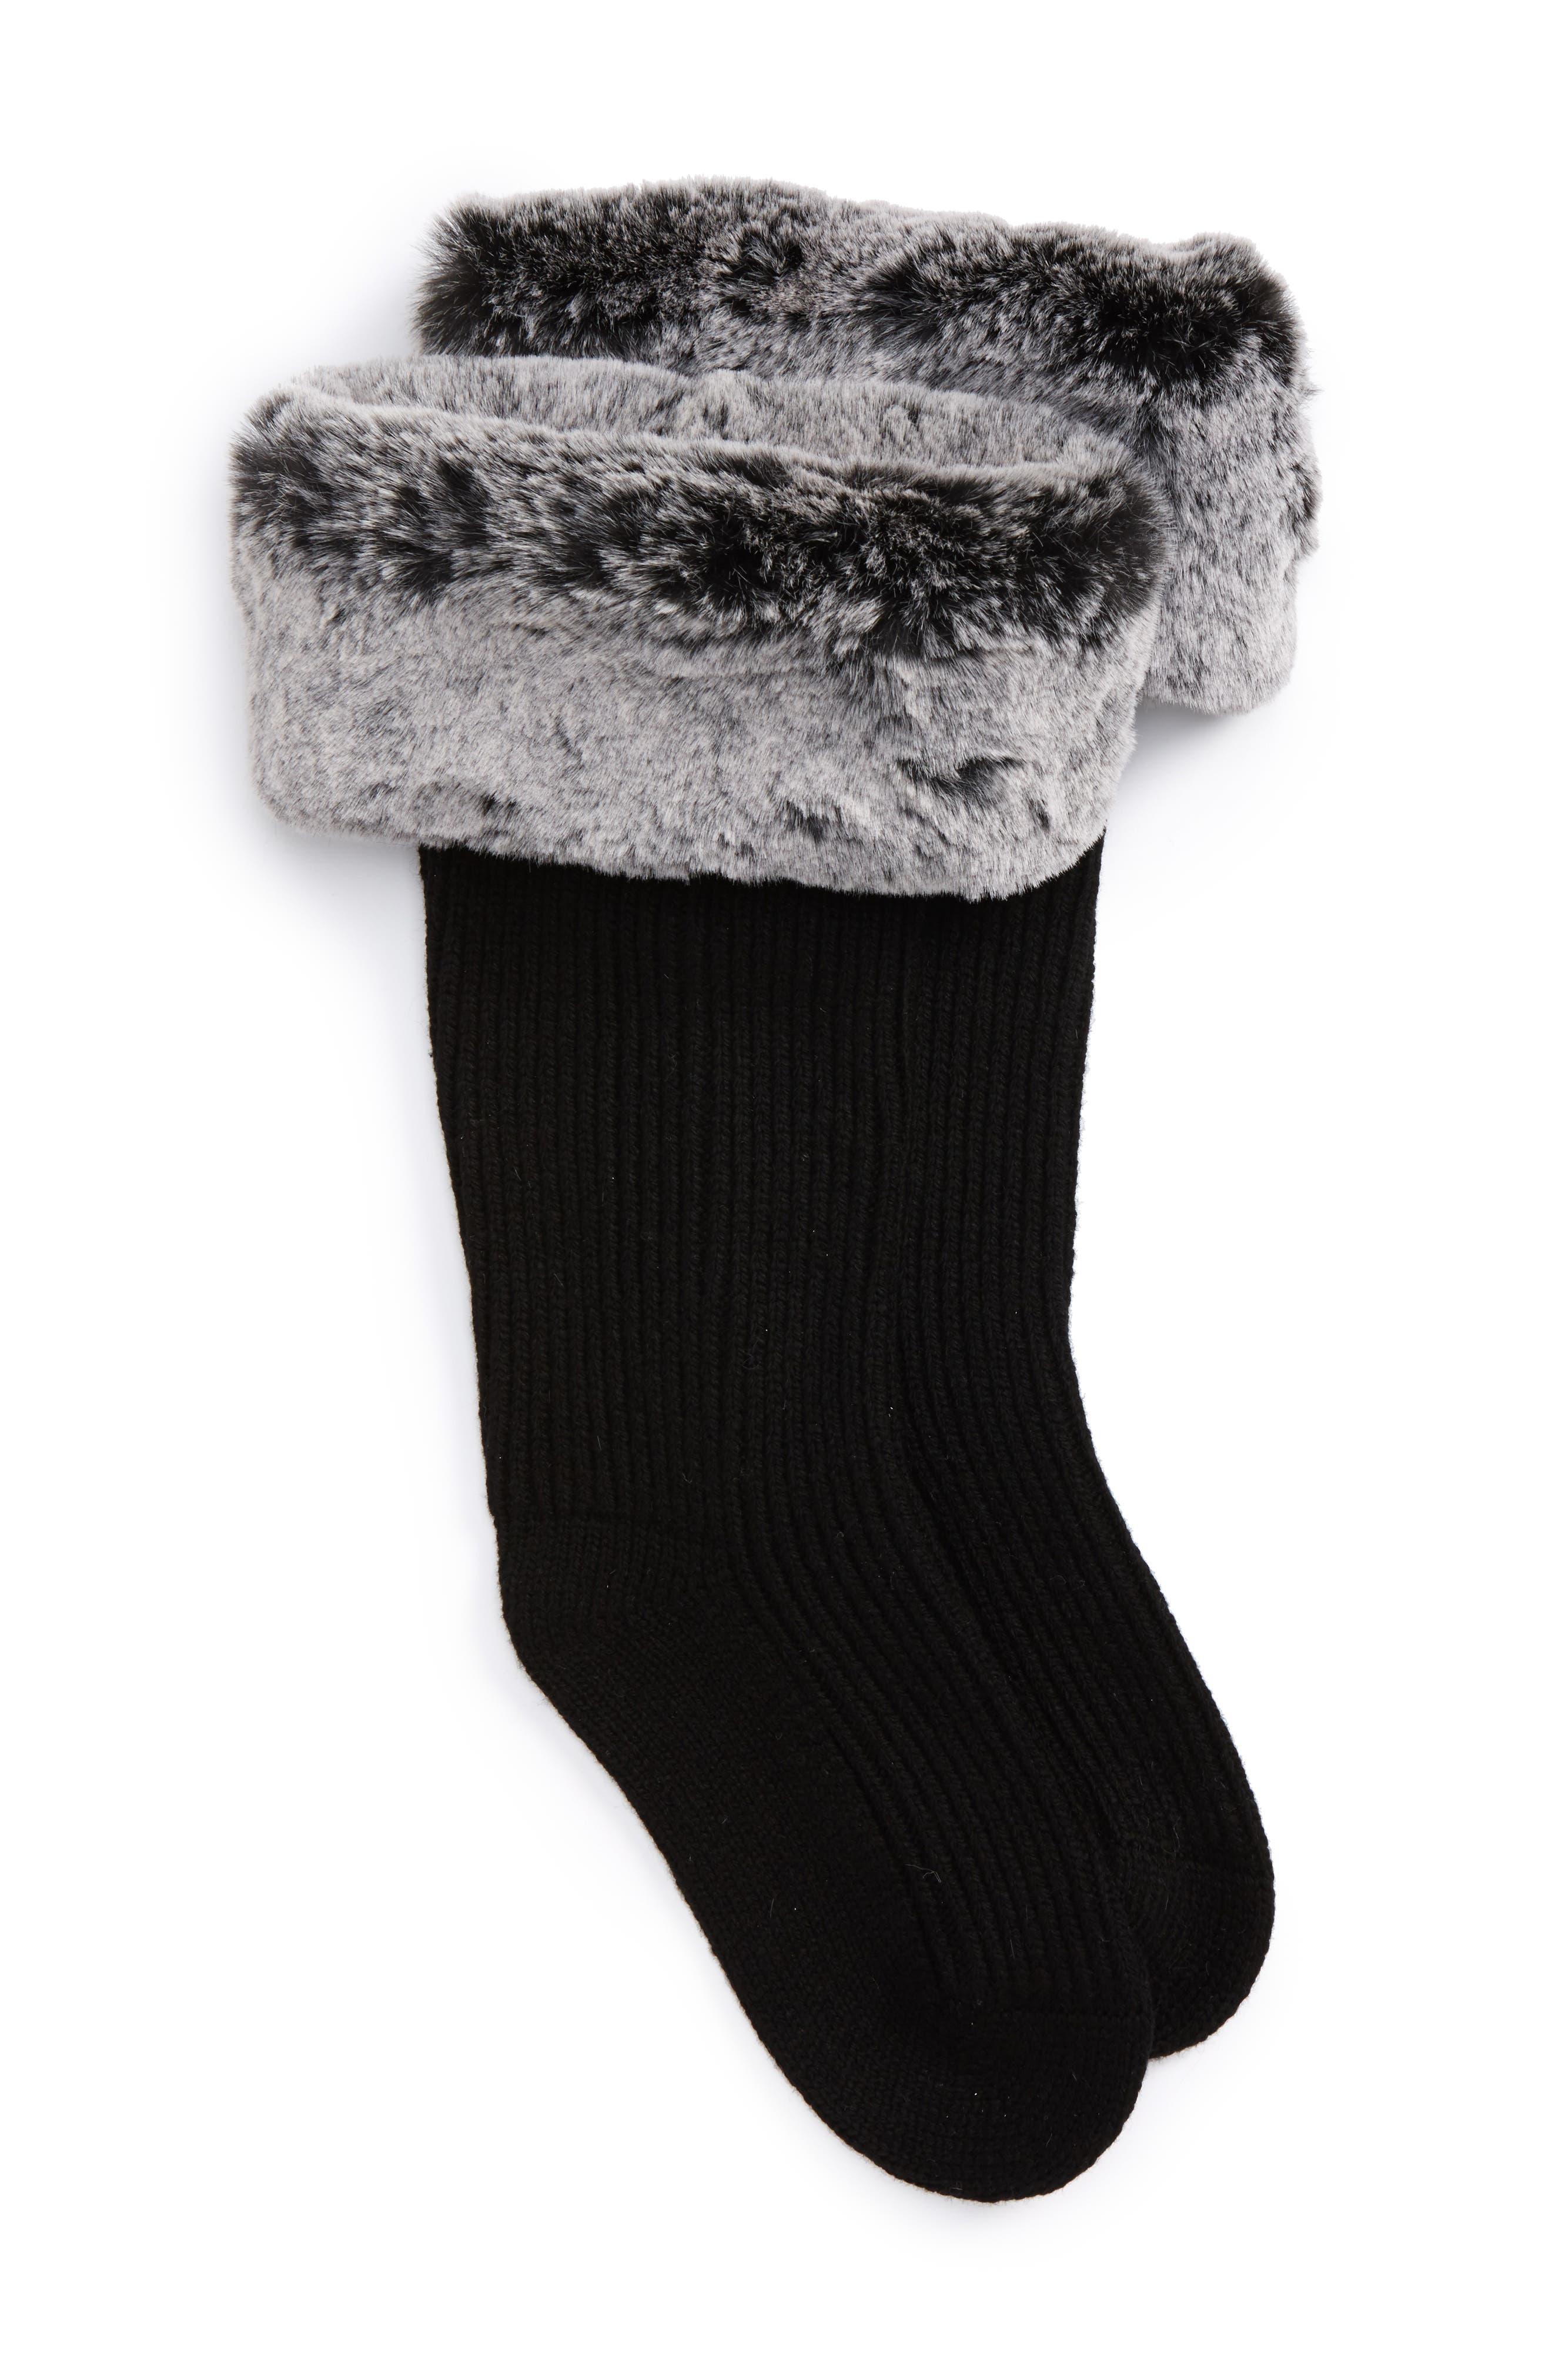 UGGpure<sup>™</sup> Tall Rain Boot Sock,                             Main thumbnail 1, color,                             Charcoal Wool